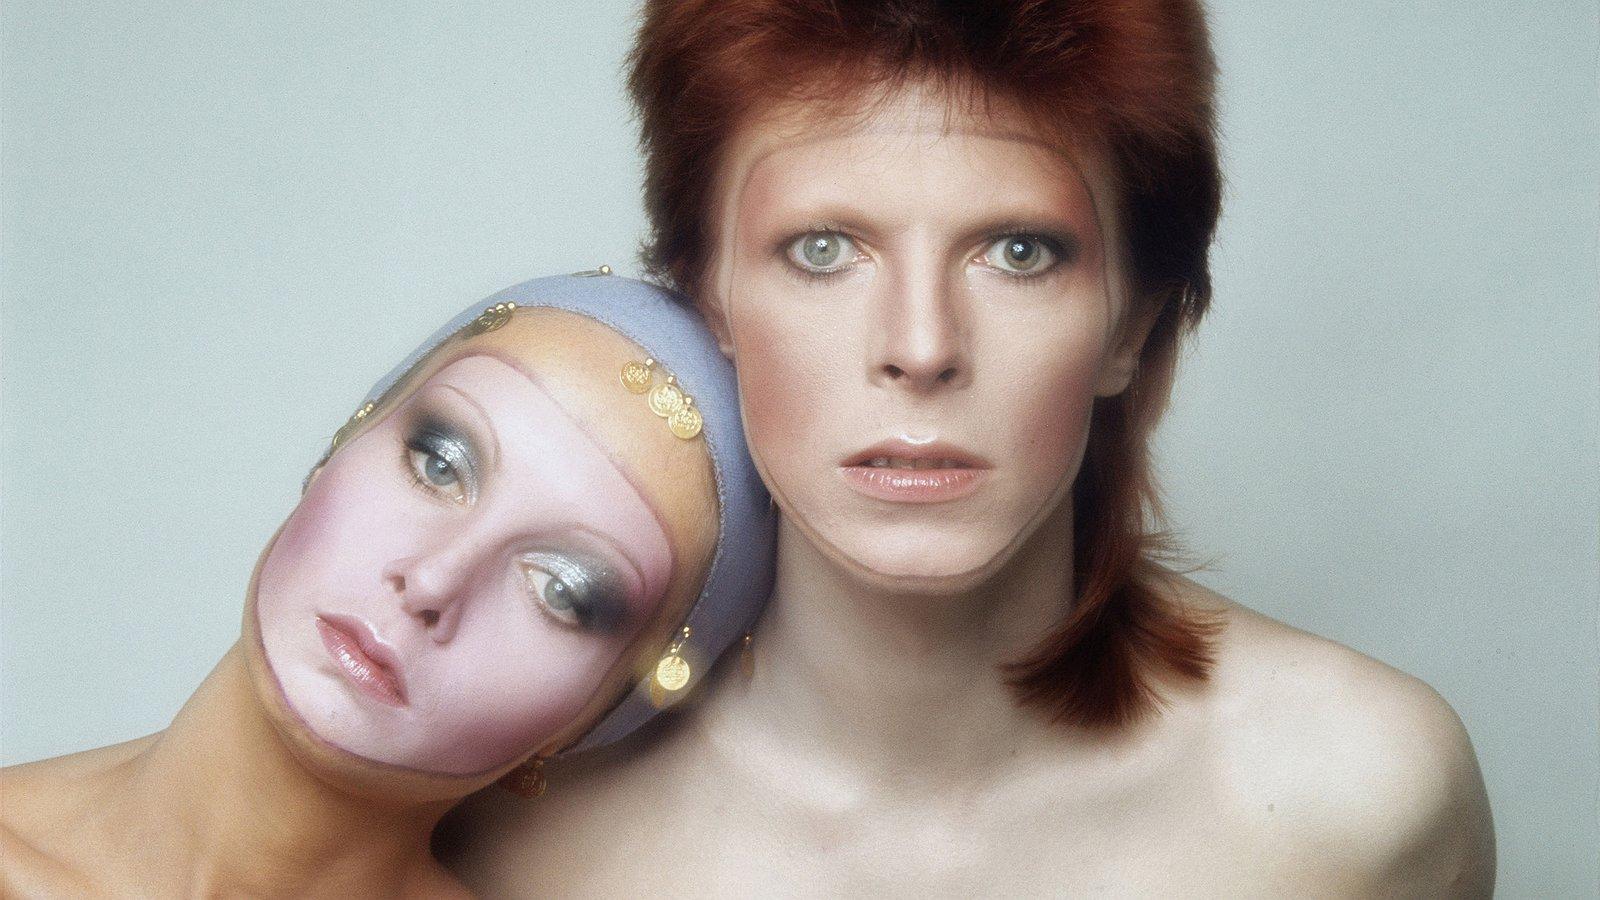 Expositie: David Bowie en Prince in Amsterdam